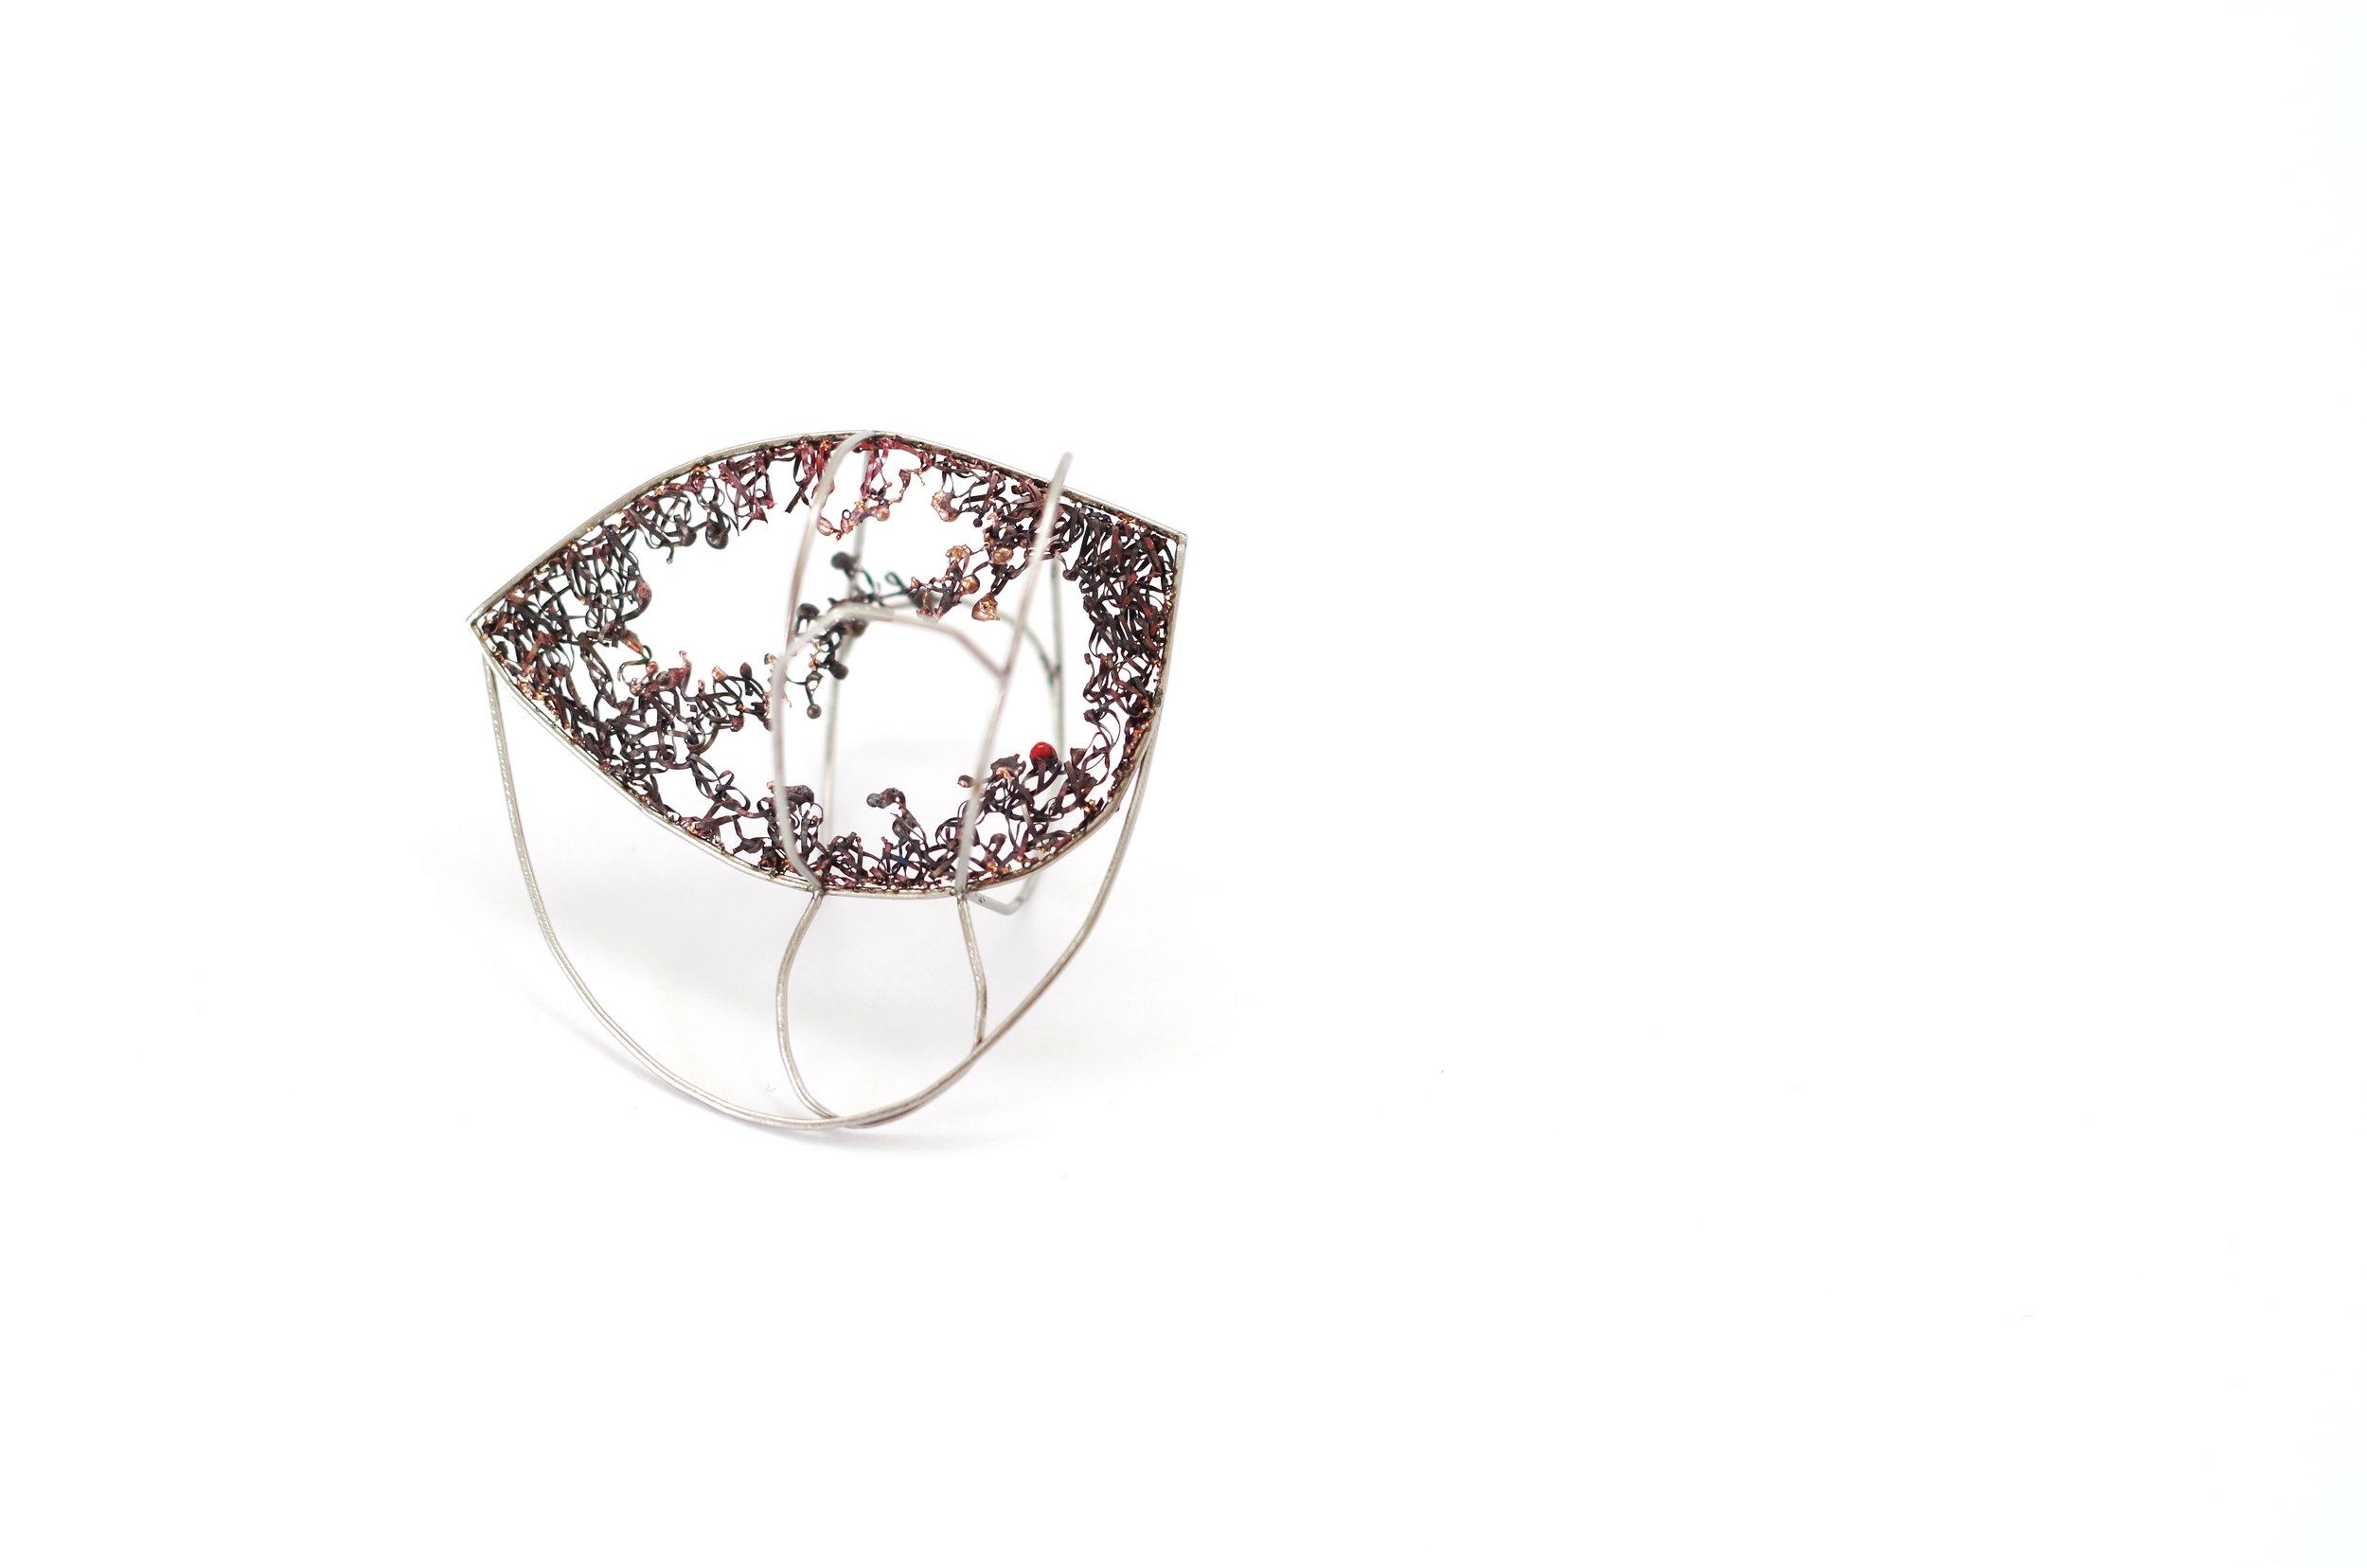 aelita ba graduate collection crochet contemporary jewelleryIMGP3918.JPG